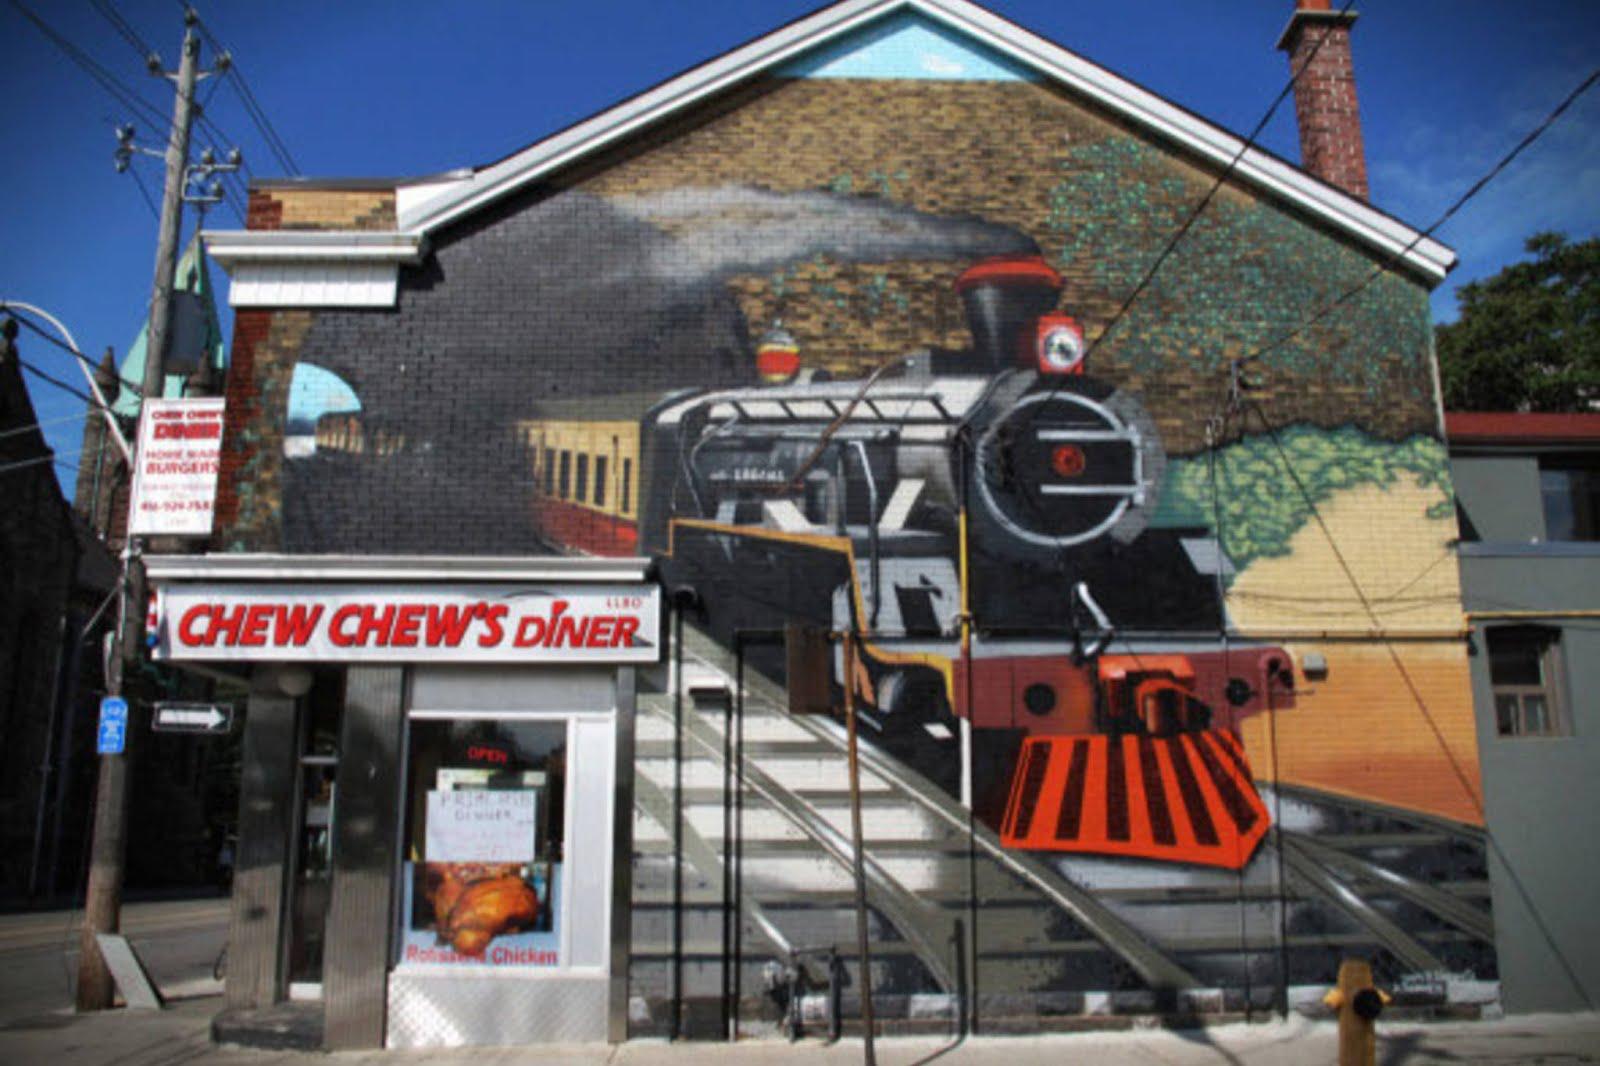 Chew chew's diner in Toronto